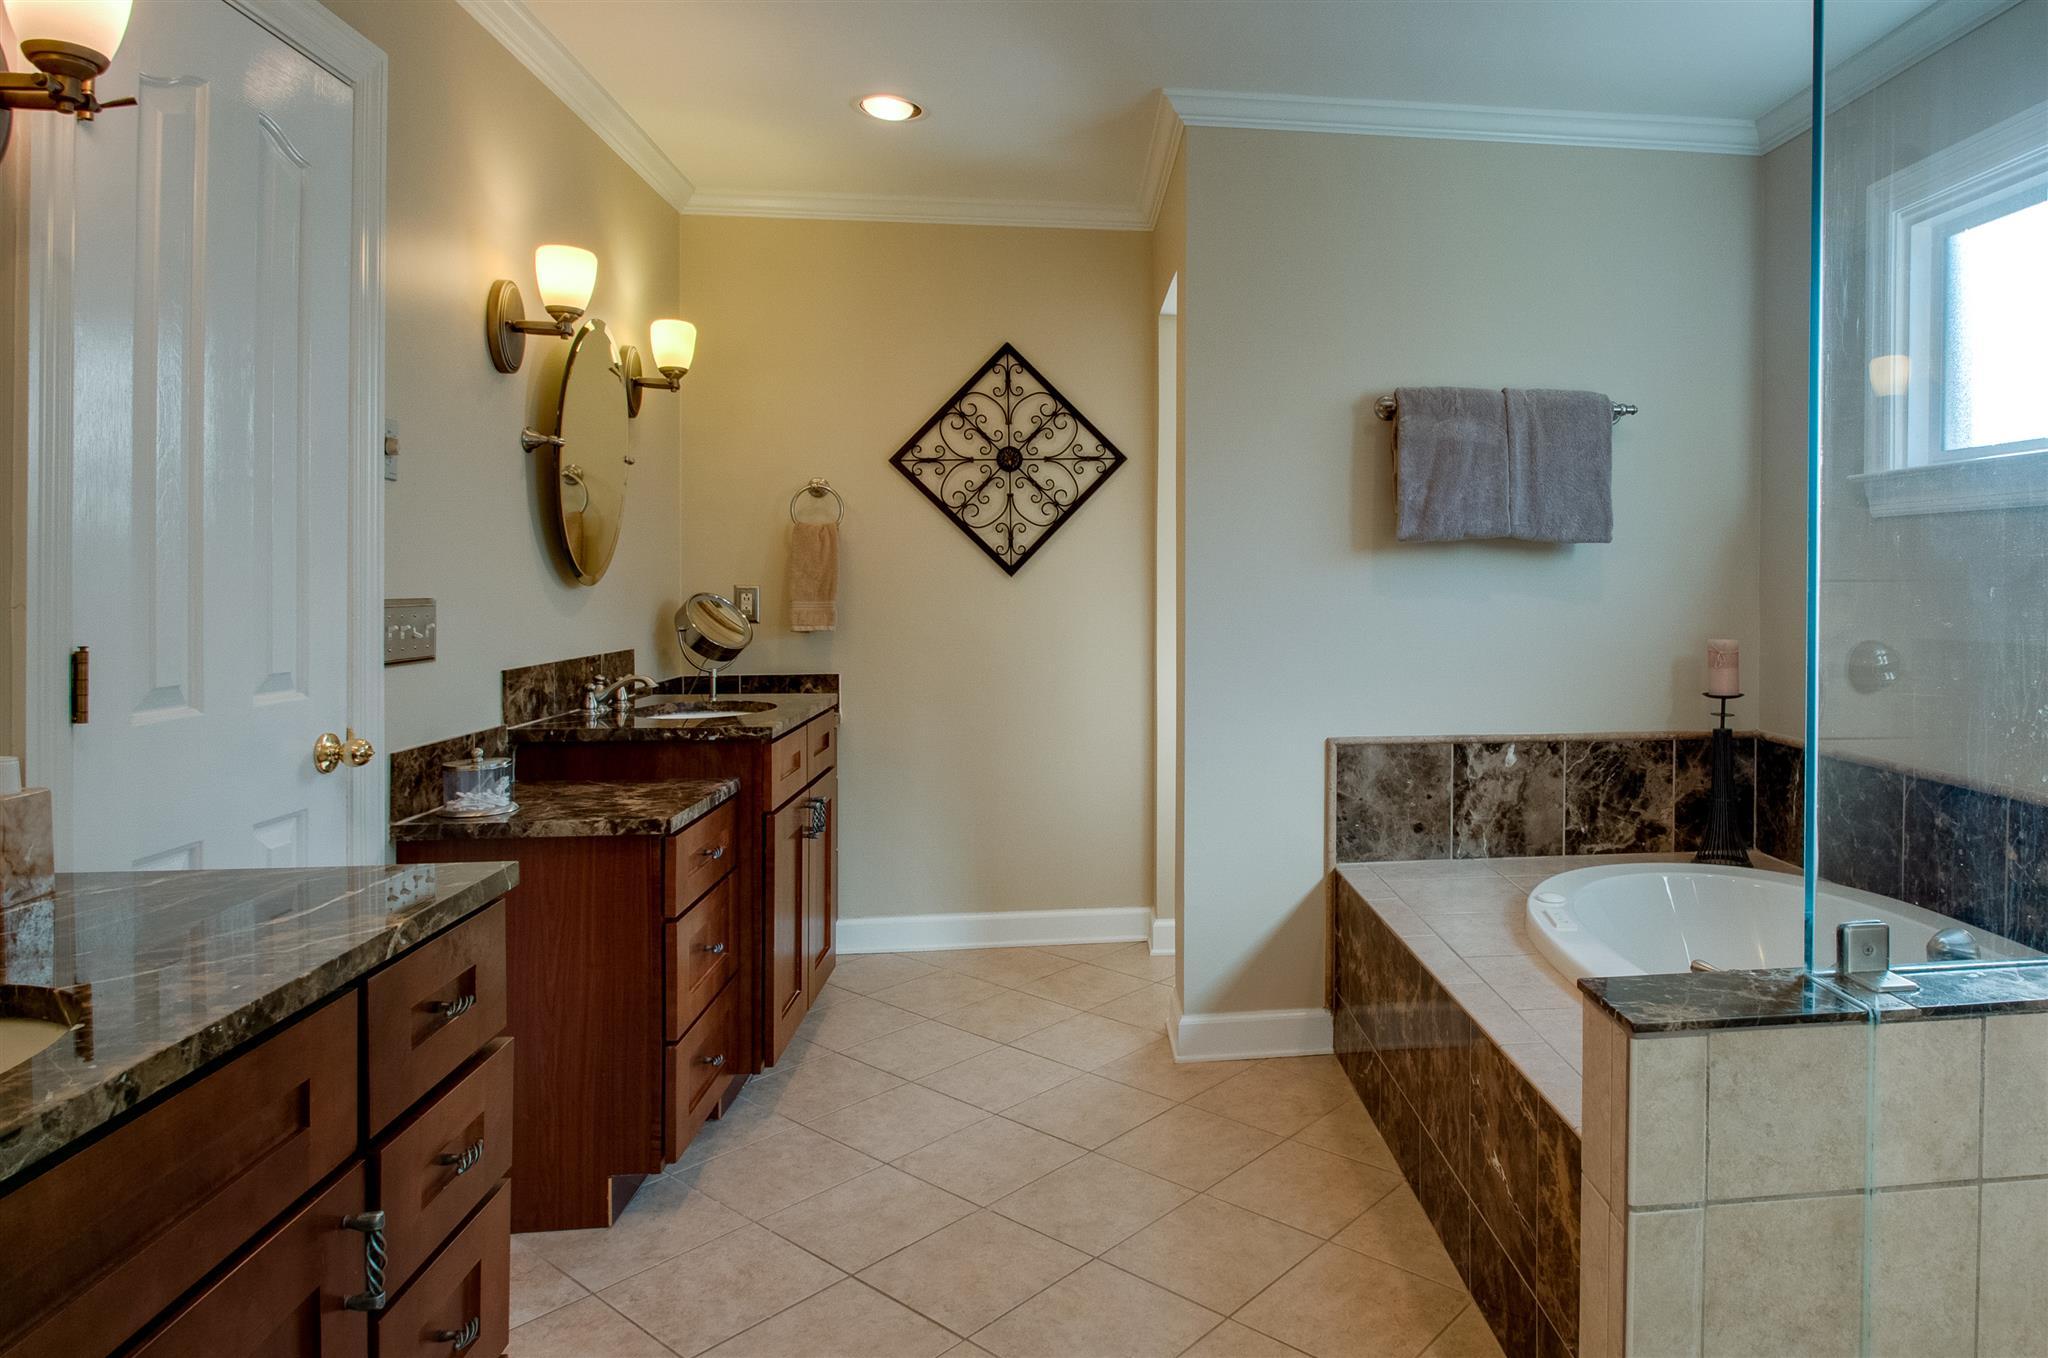 Bathroom Cabinets Nashville Tn 8452 indian hills dr, nashville, tn 37221 mls# 1799864 - movoto